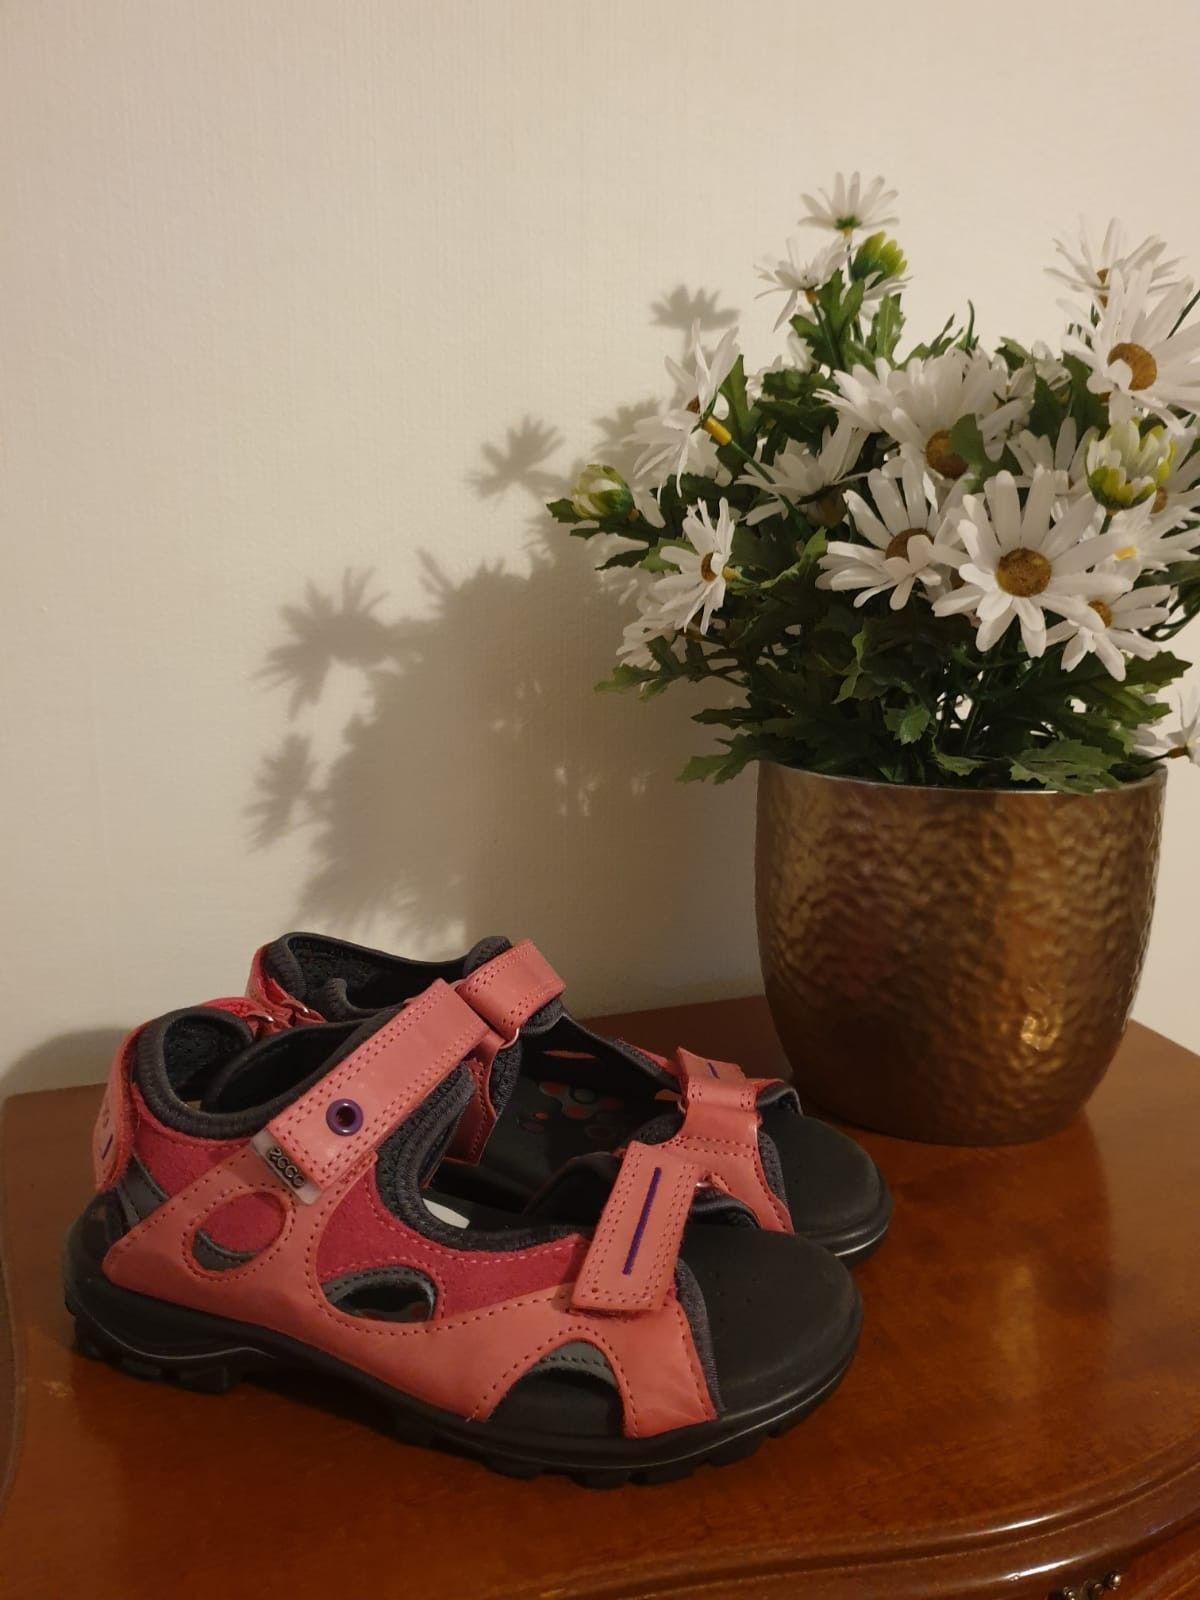 8d04960f4c0 Ecco sandaler str 31   FINN.no